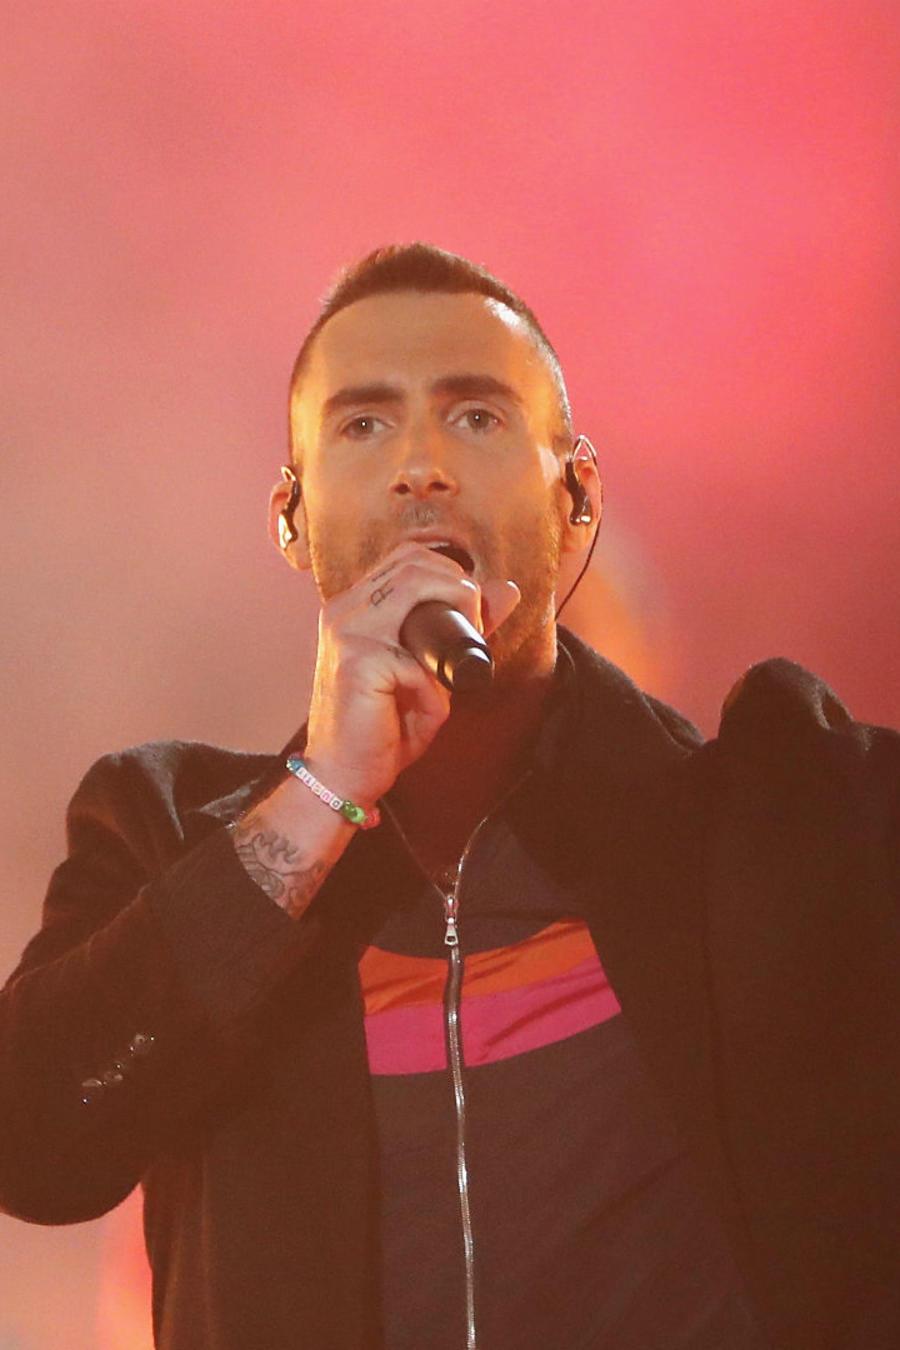 Maroon 5, Guns N' Roses, Dj Khaled to Perform at Pre-Super Bowl Shows